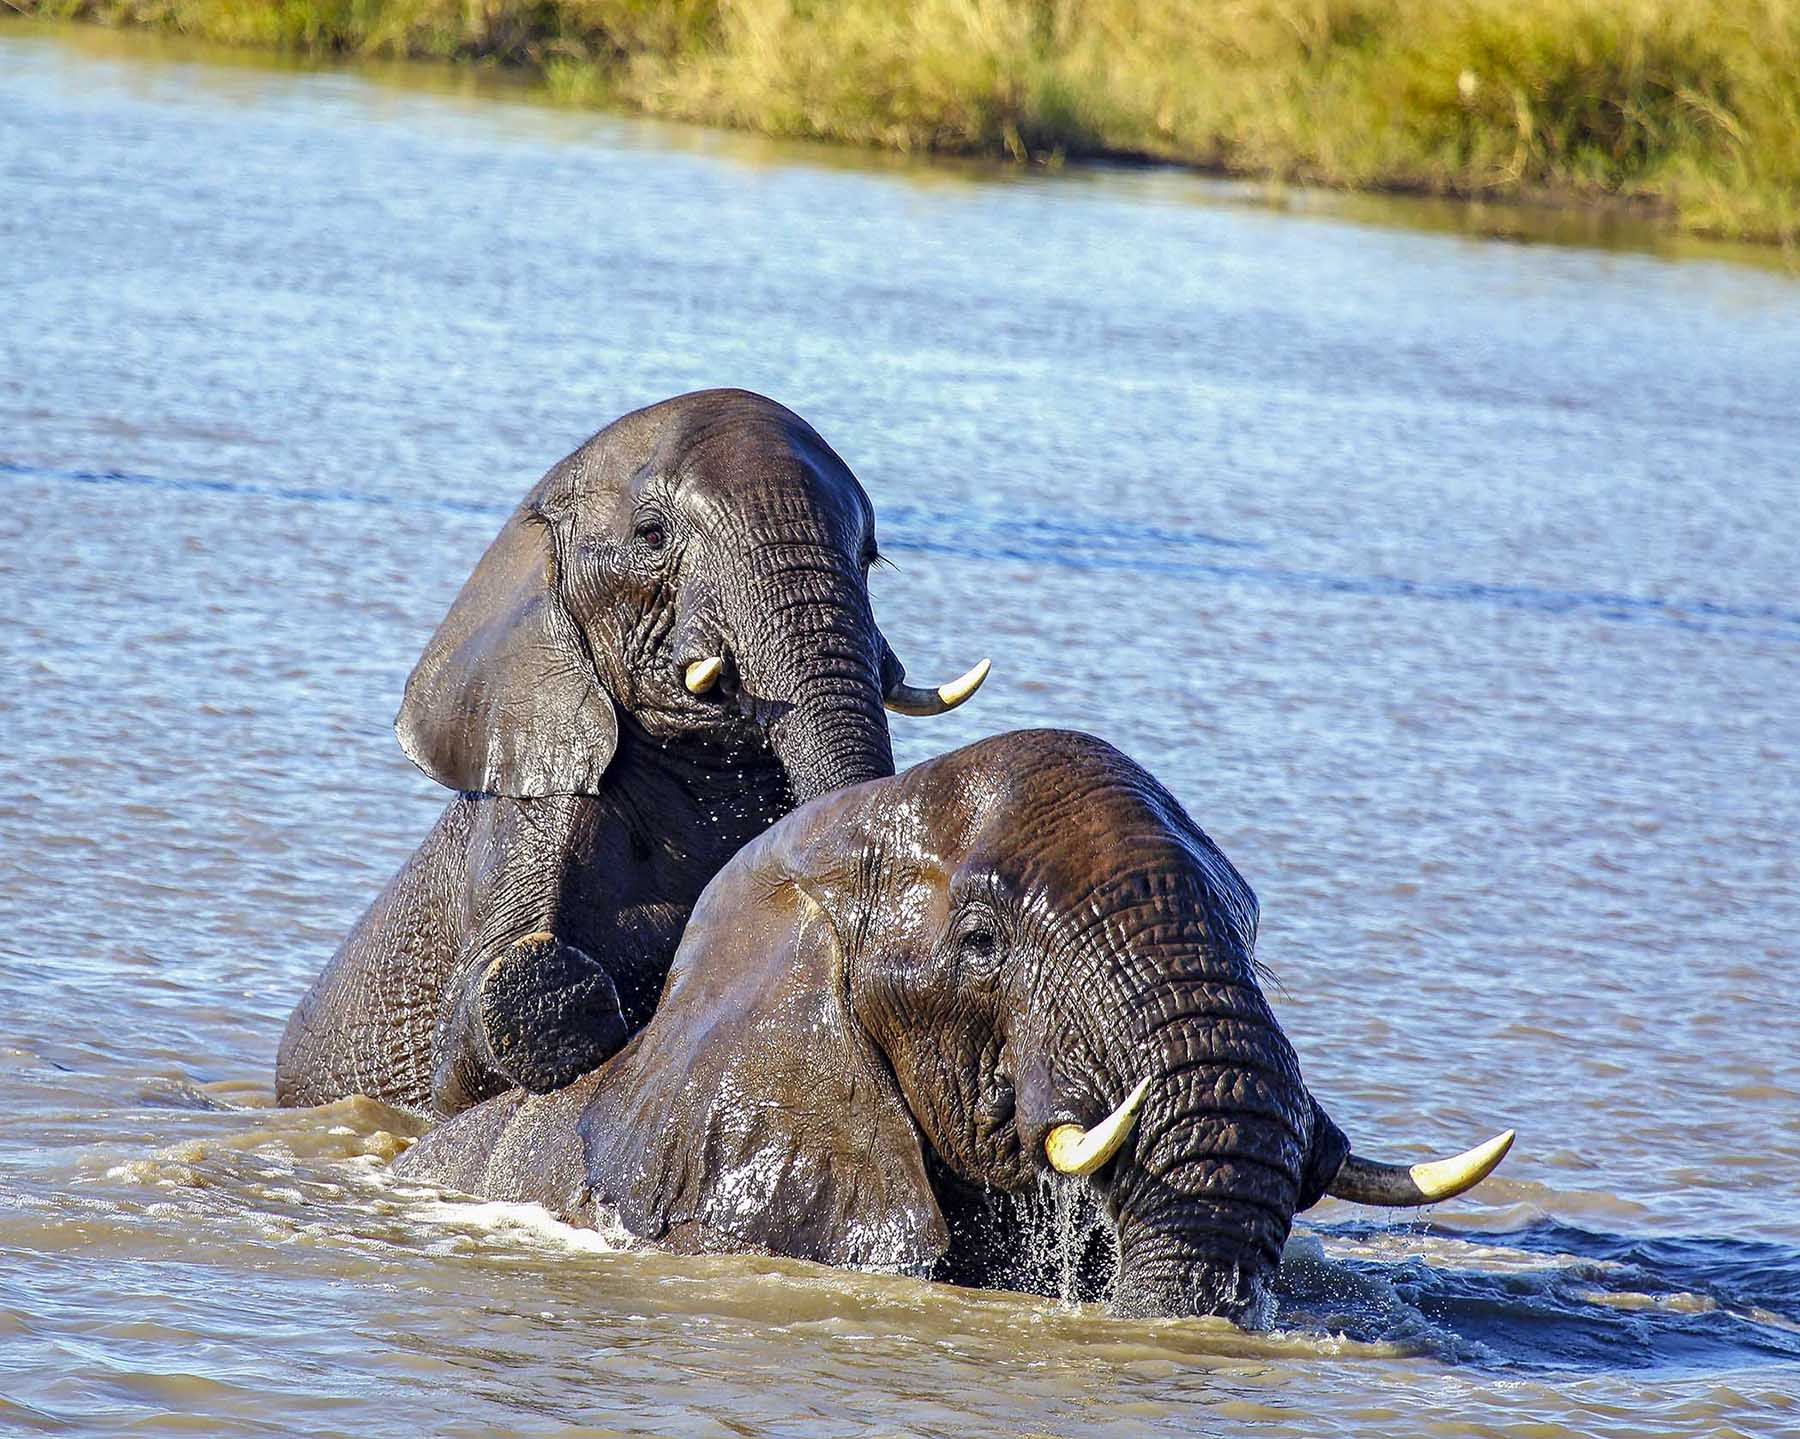 Young_Elephants _Playing